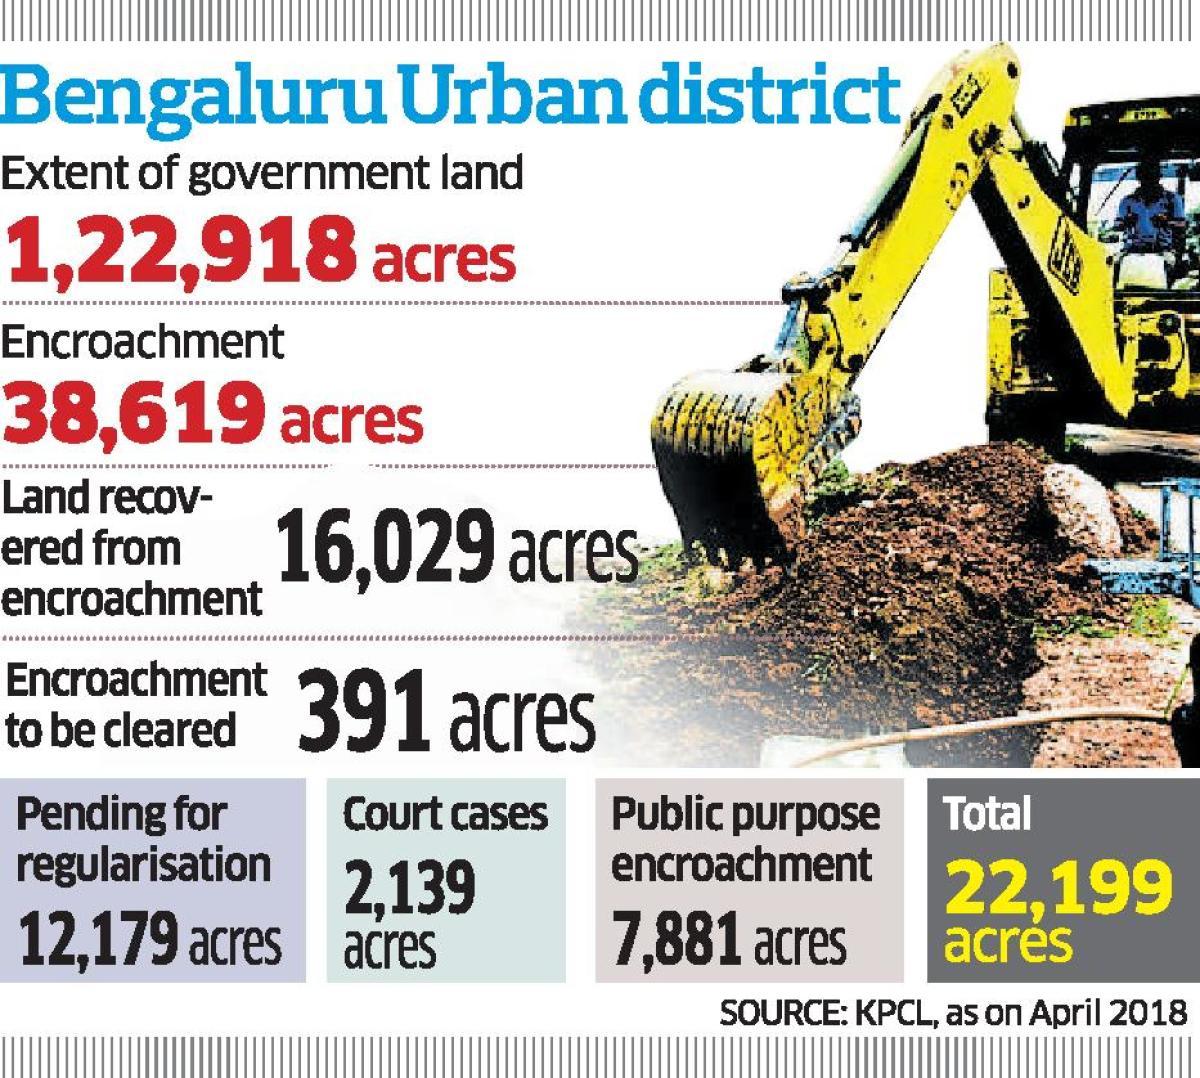 Bengaluru encroachment